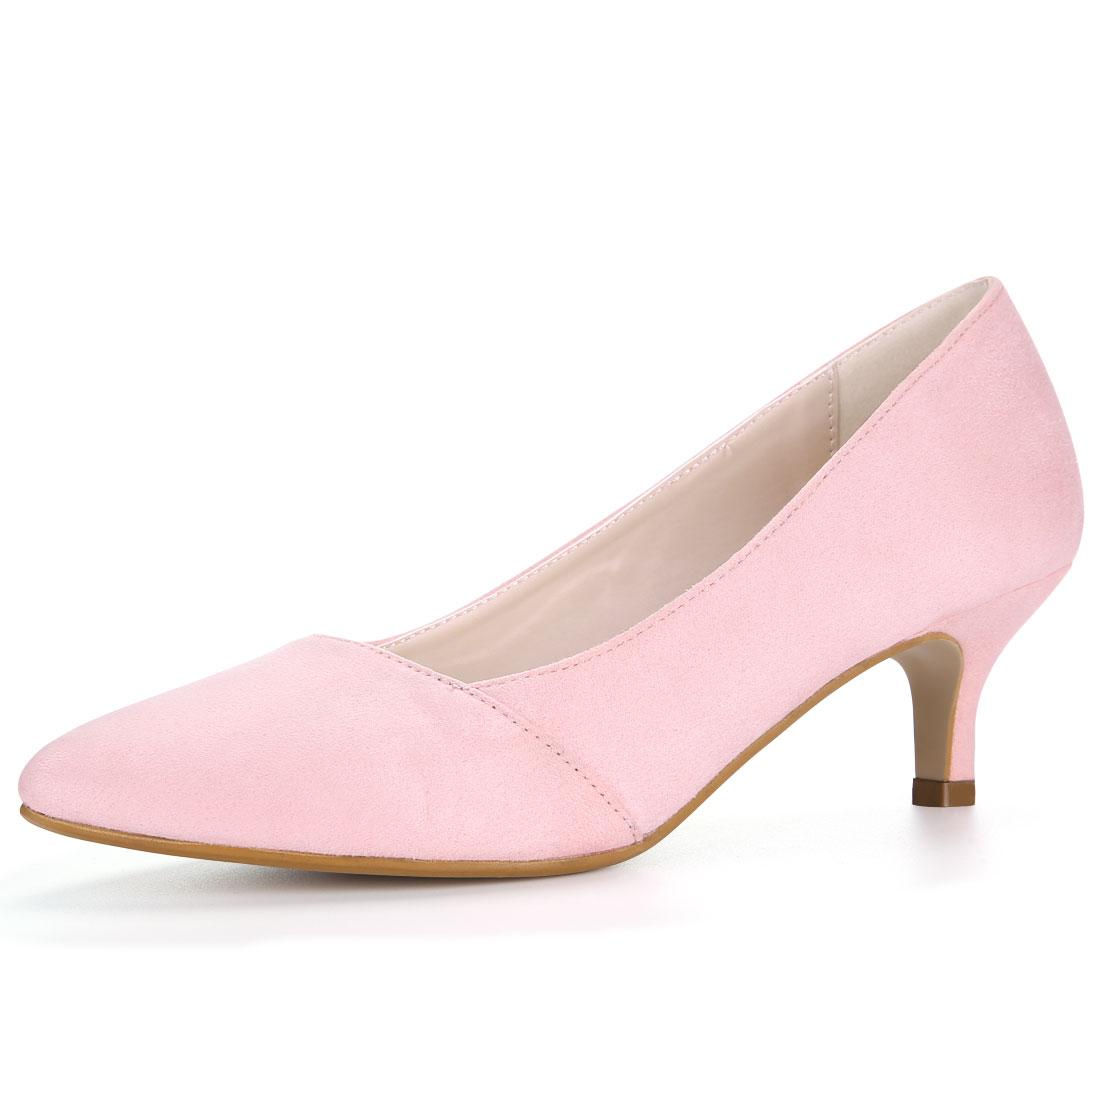 Women Pointed Toe Mid Stiletto Heel Pumps Pink US 9.5